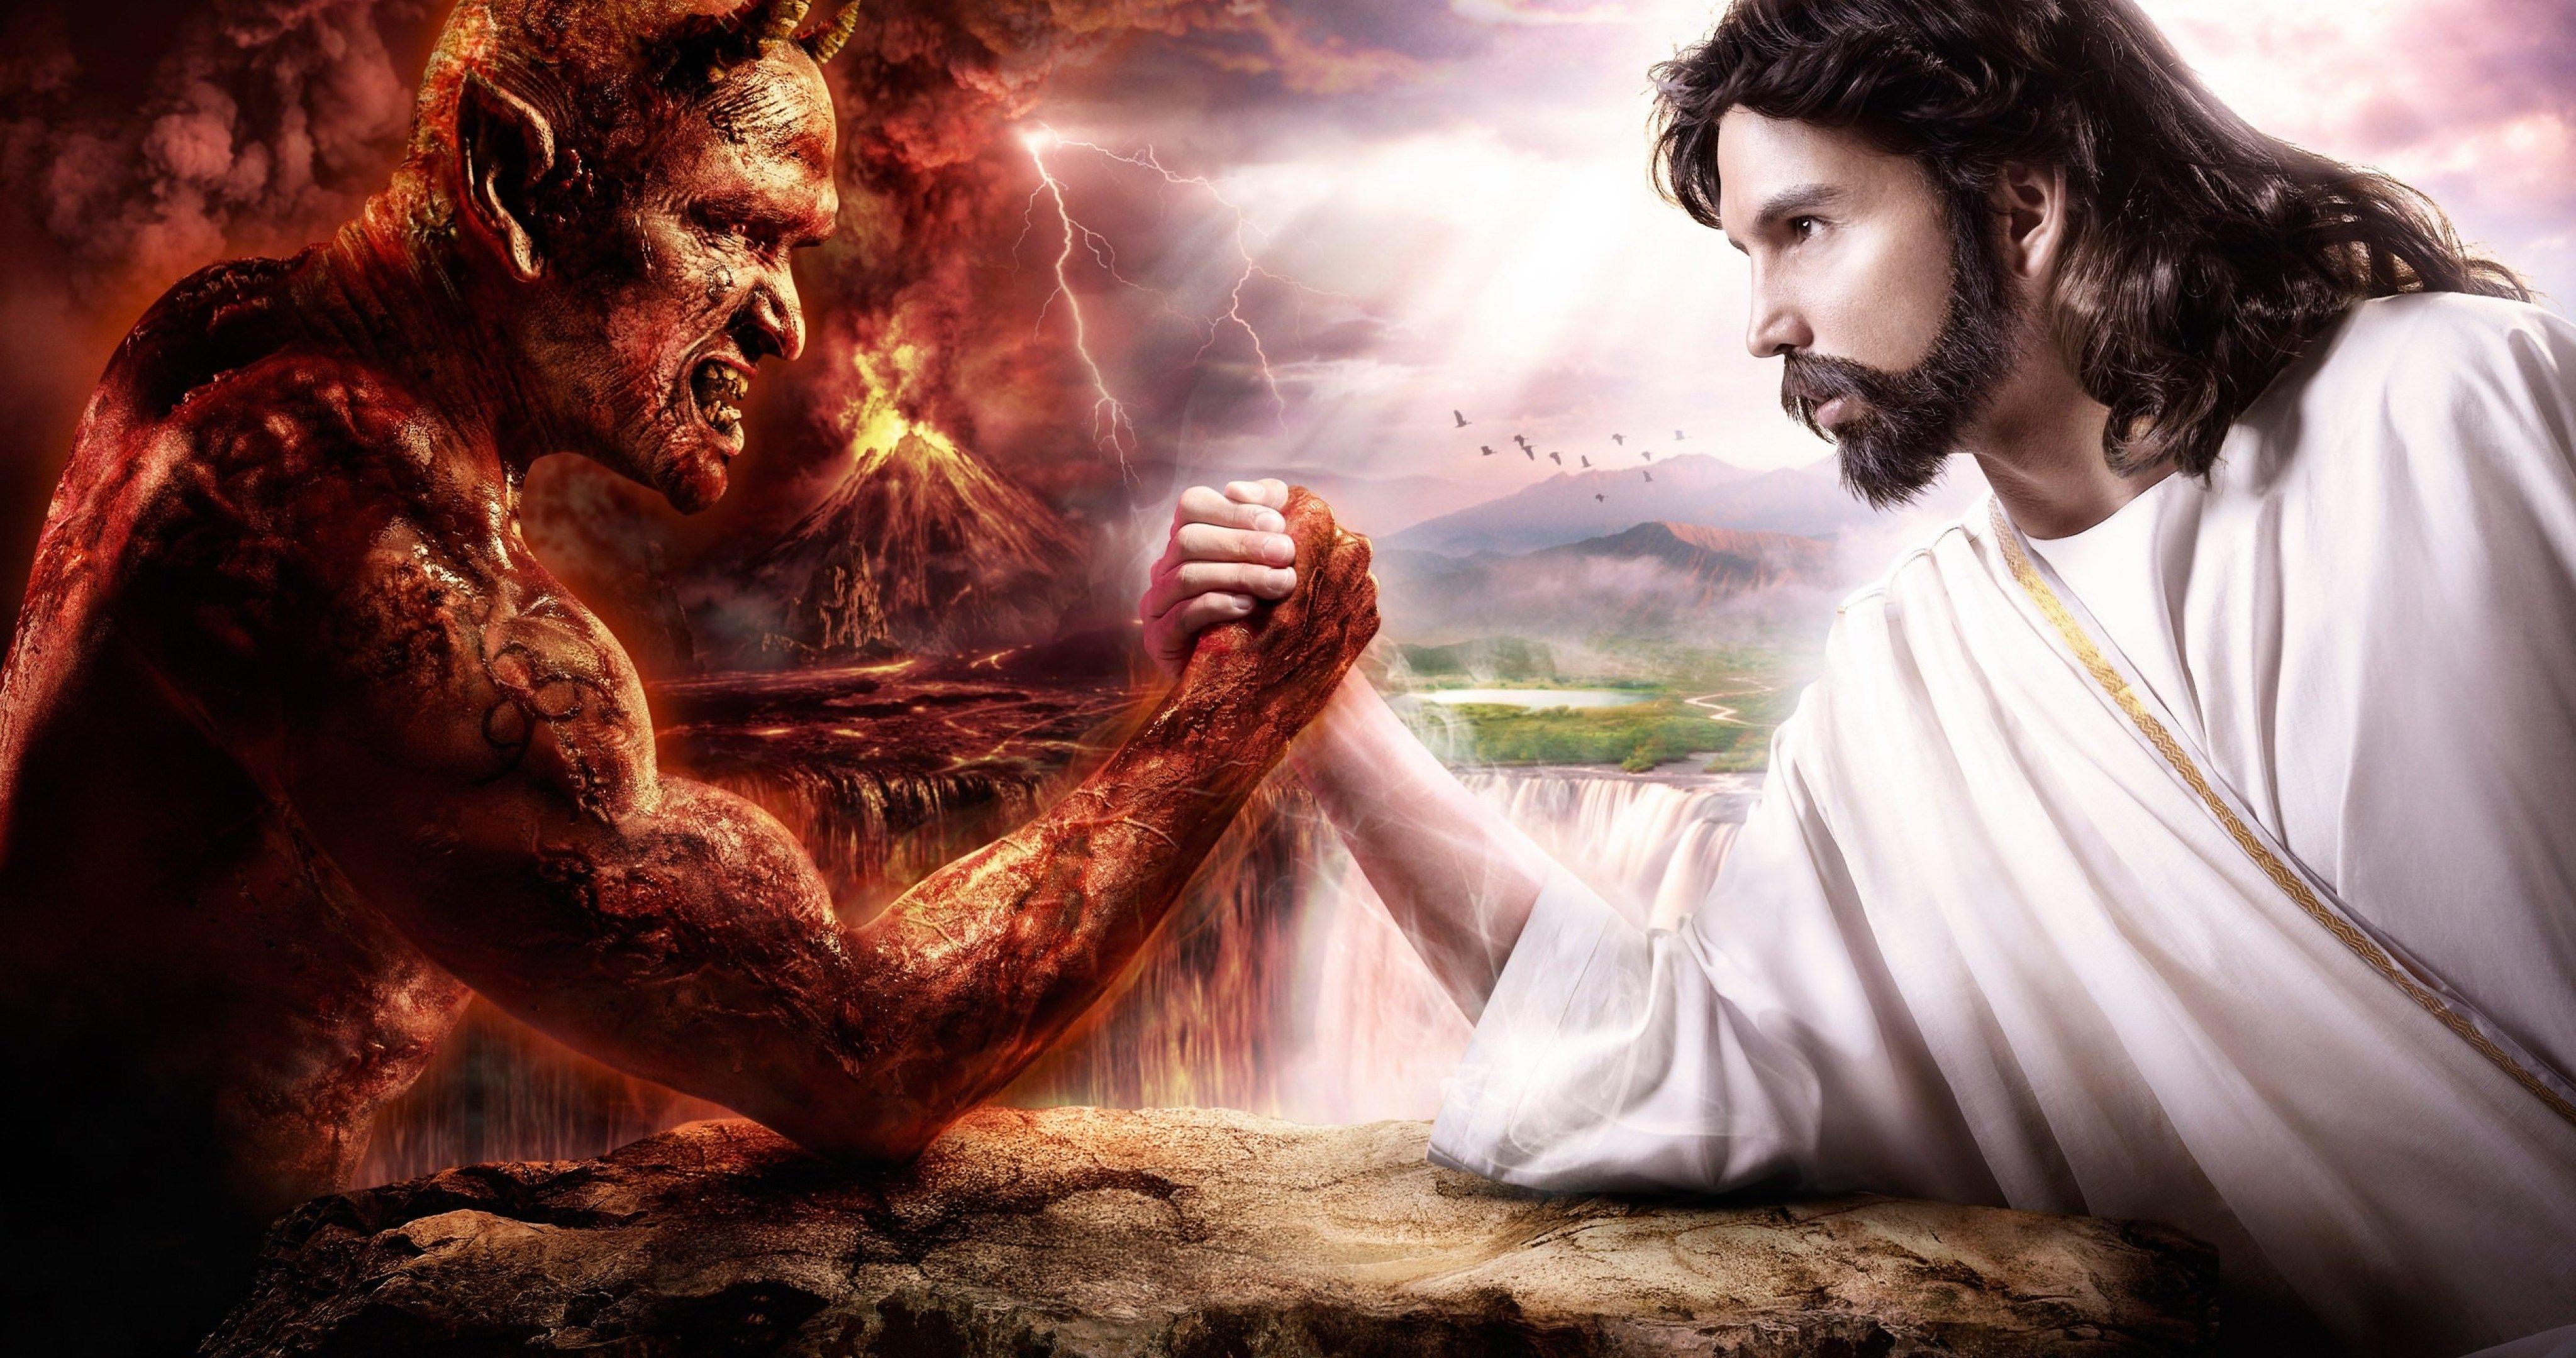 jesus vs devil 4k ultra hd wallpaper | sharovarka | pinterest | hd